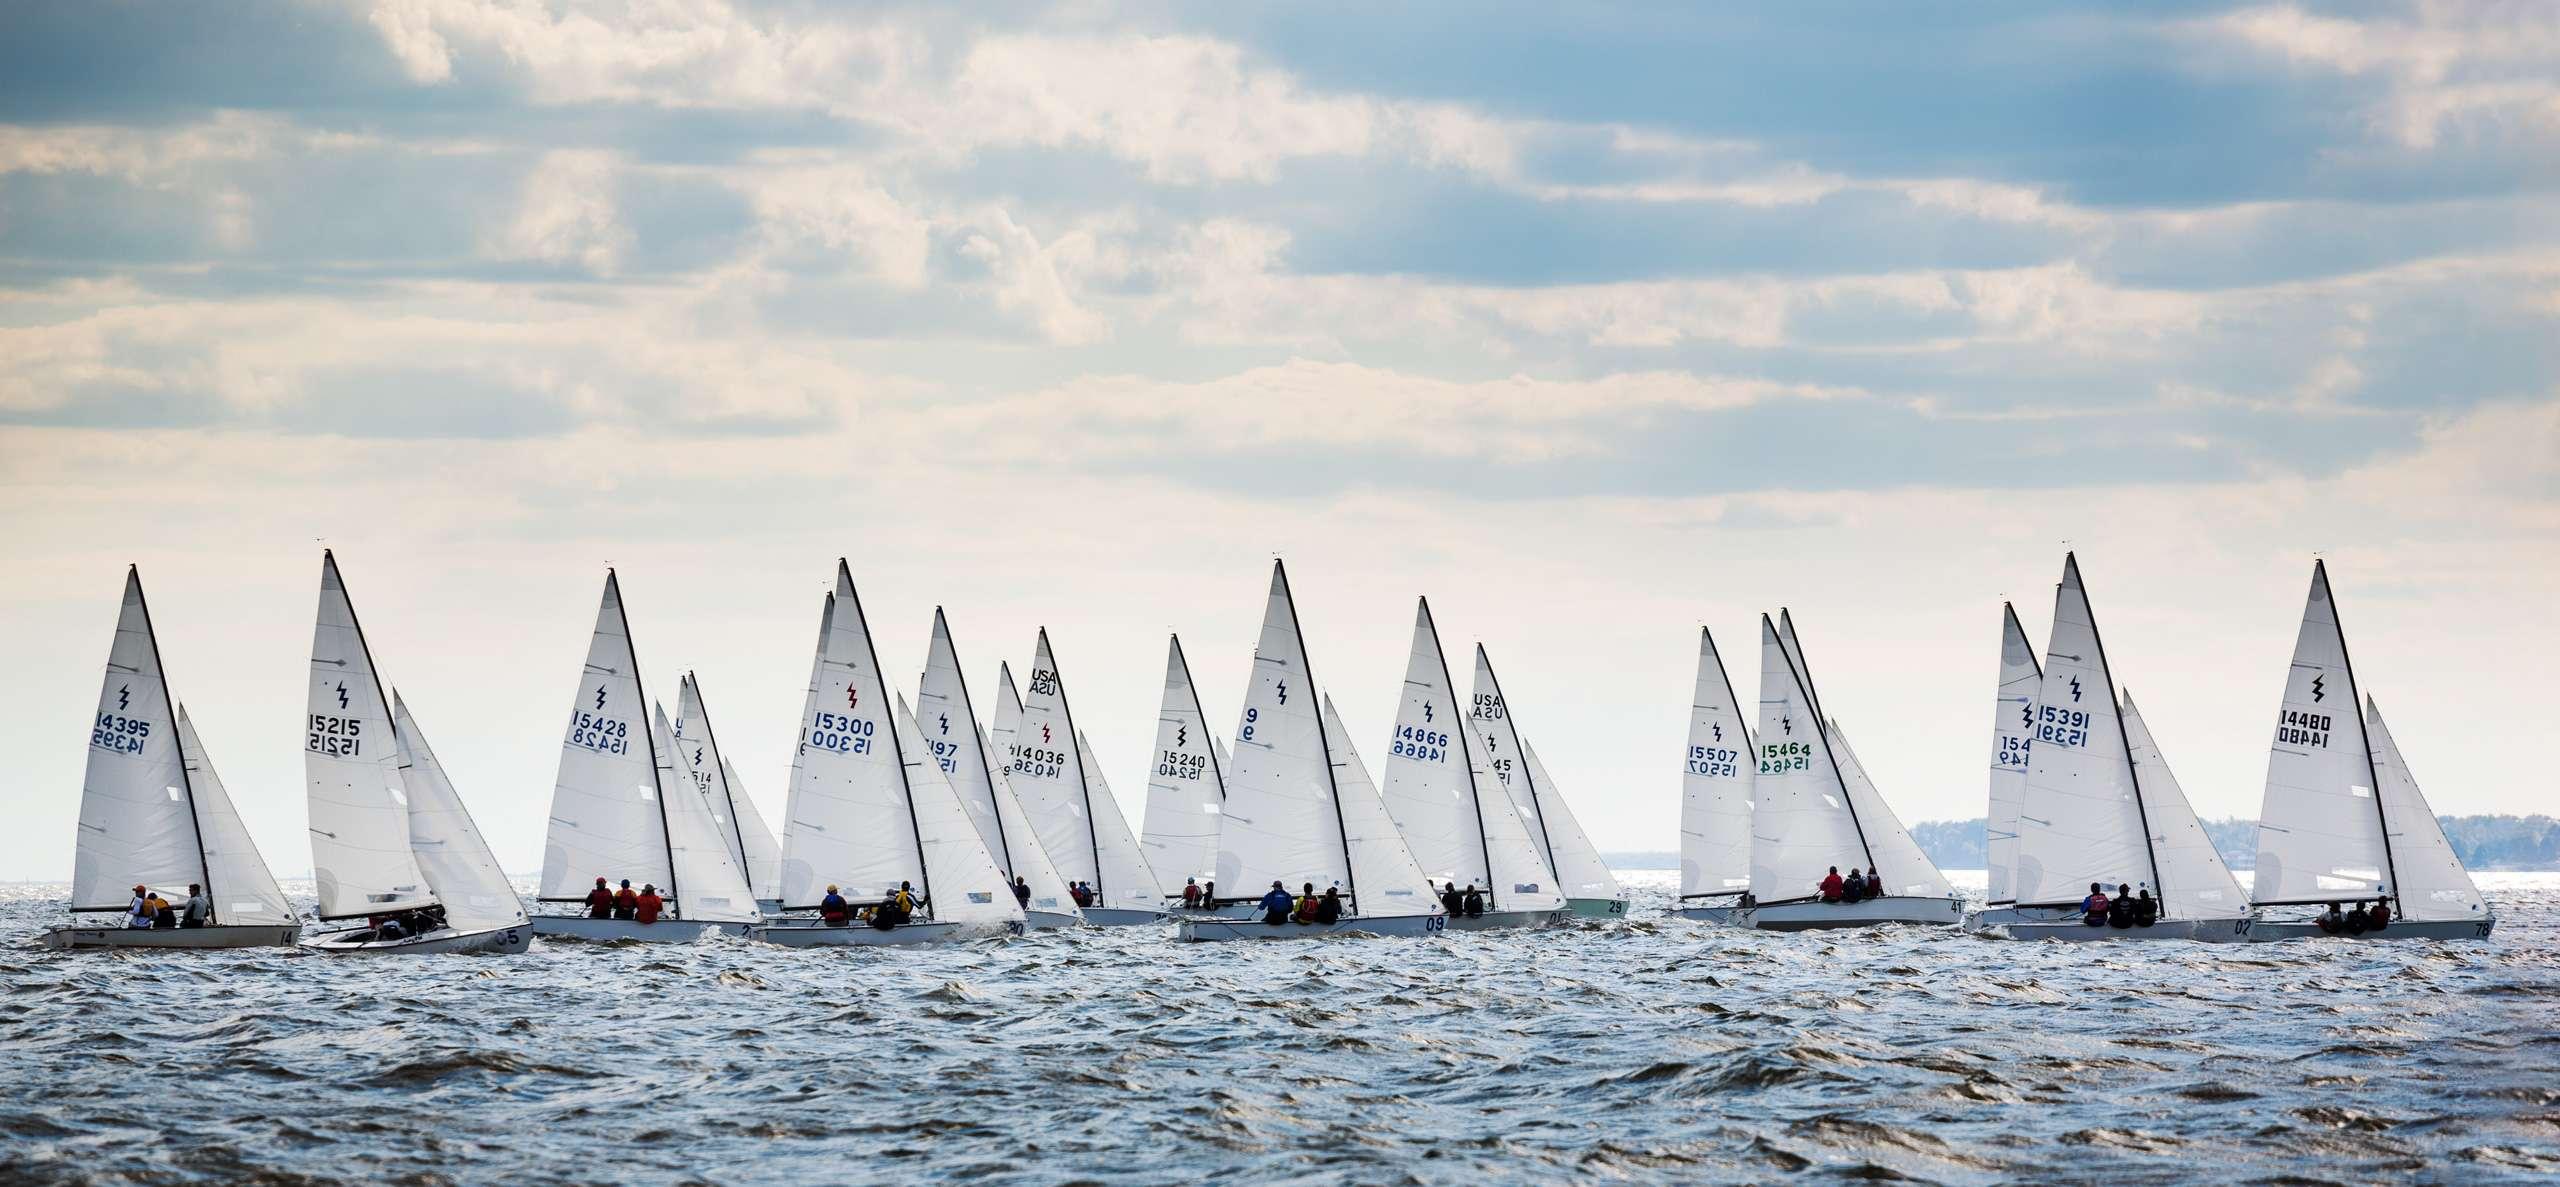 PORTFOLIO - Sailing - Chesapeake #2    PCG748